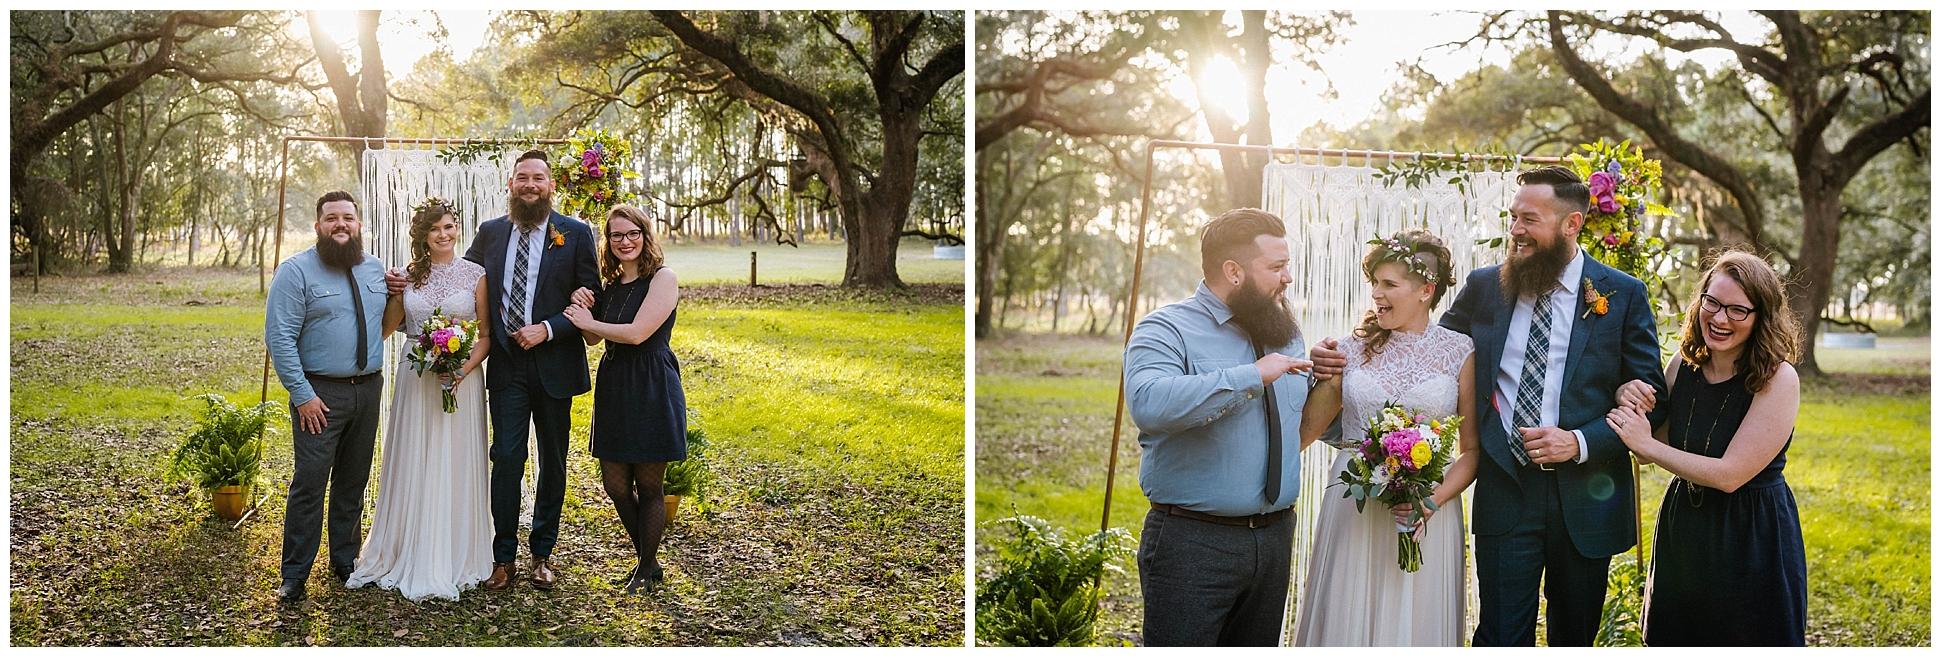 magical-outdoor-florida-wedding-smoke-bombs-flowers-crown-beard_0042.jpg